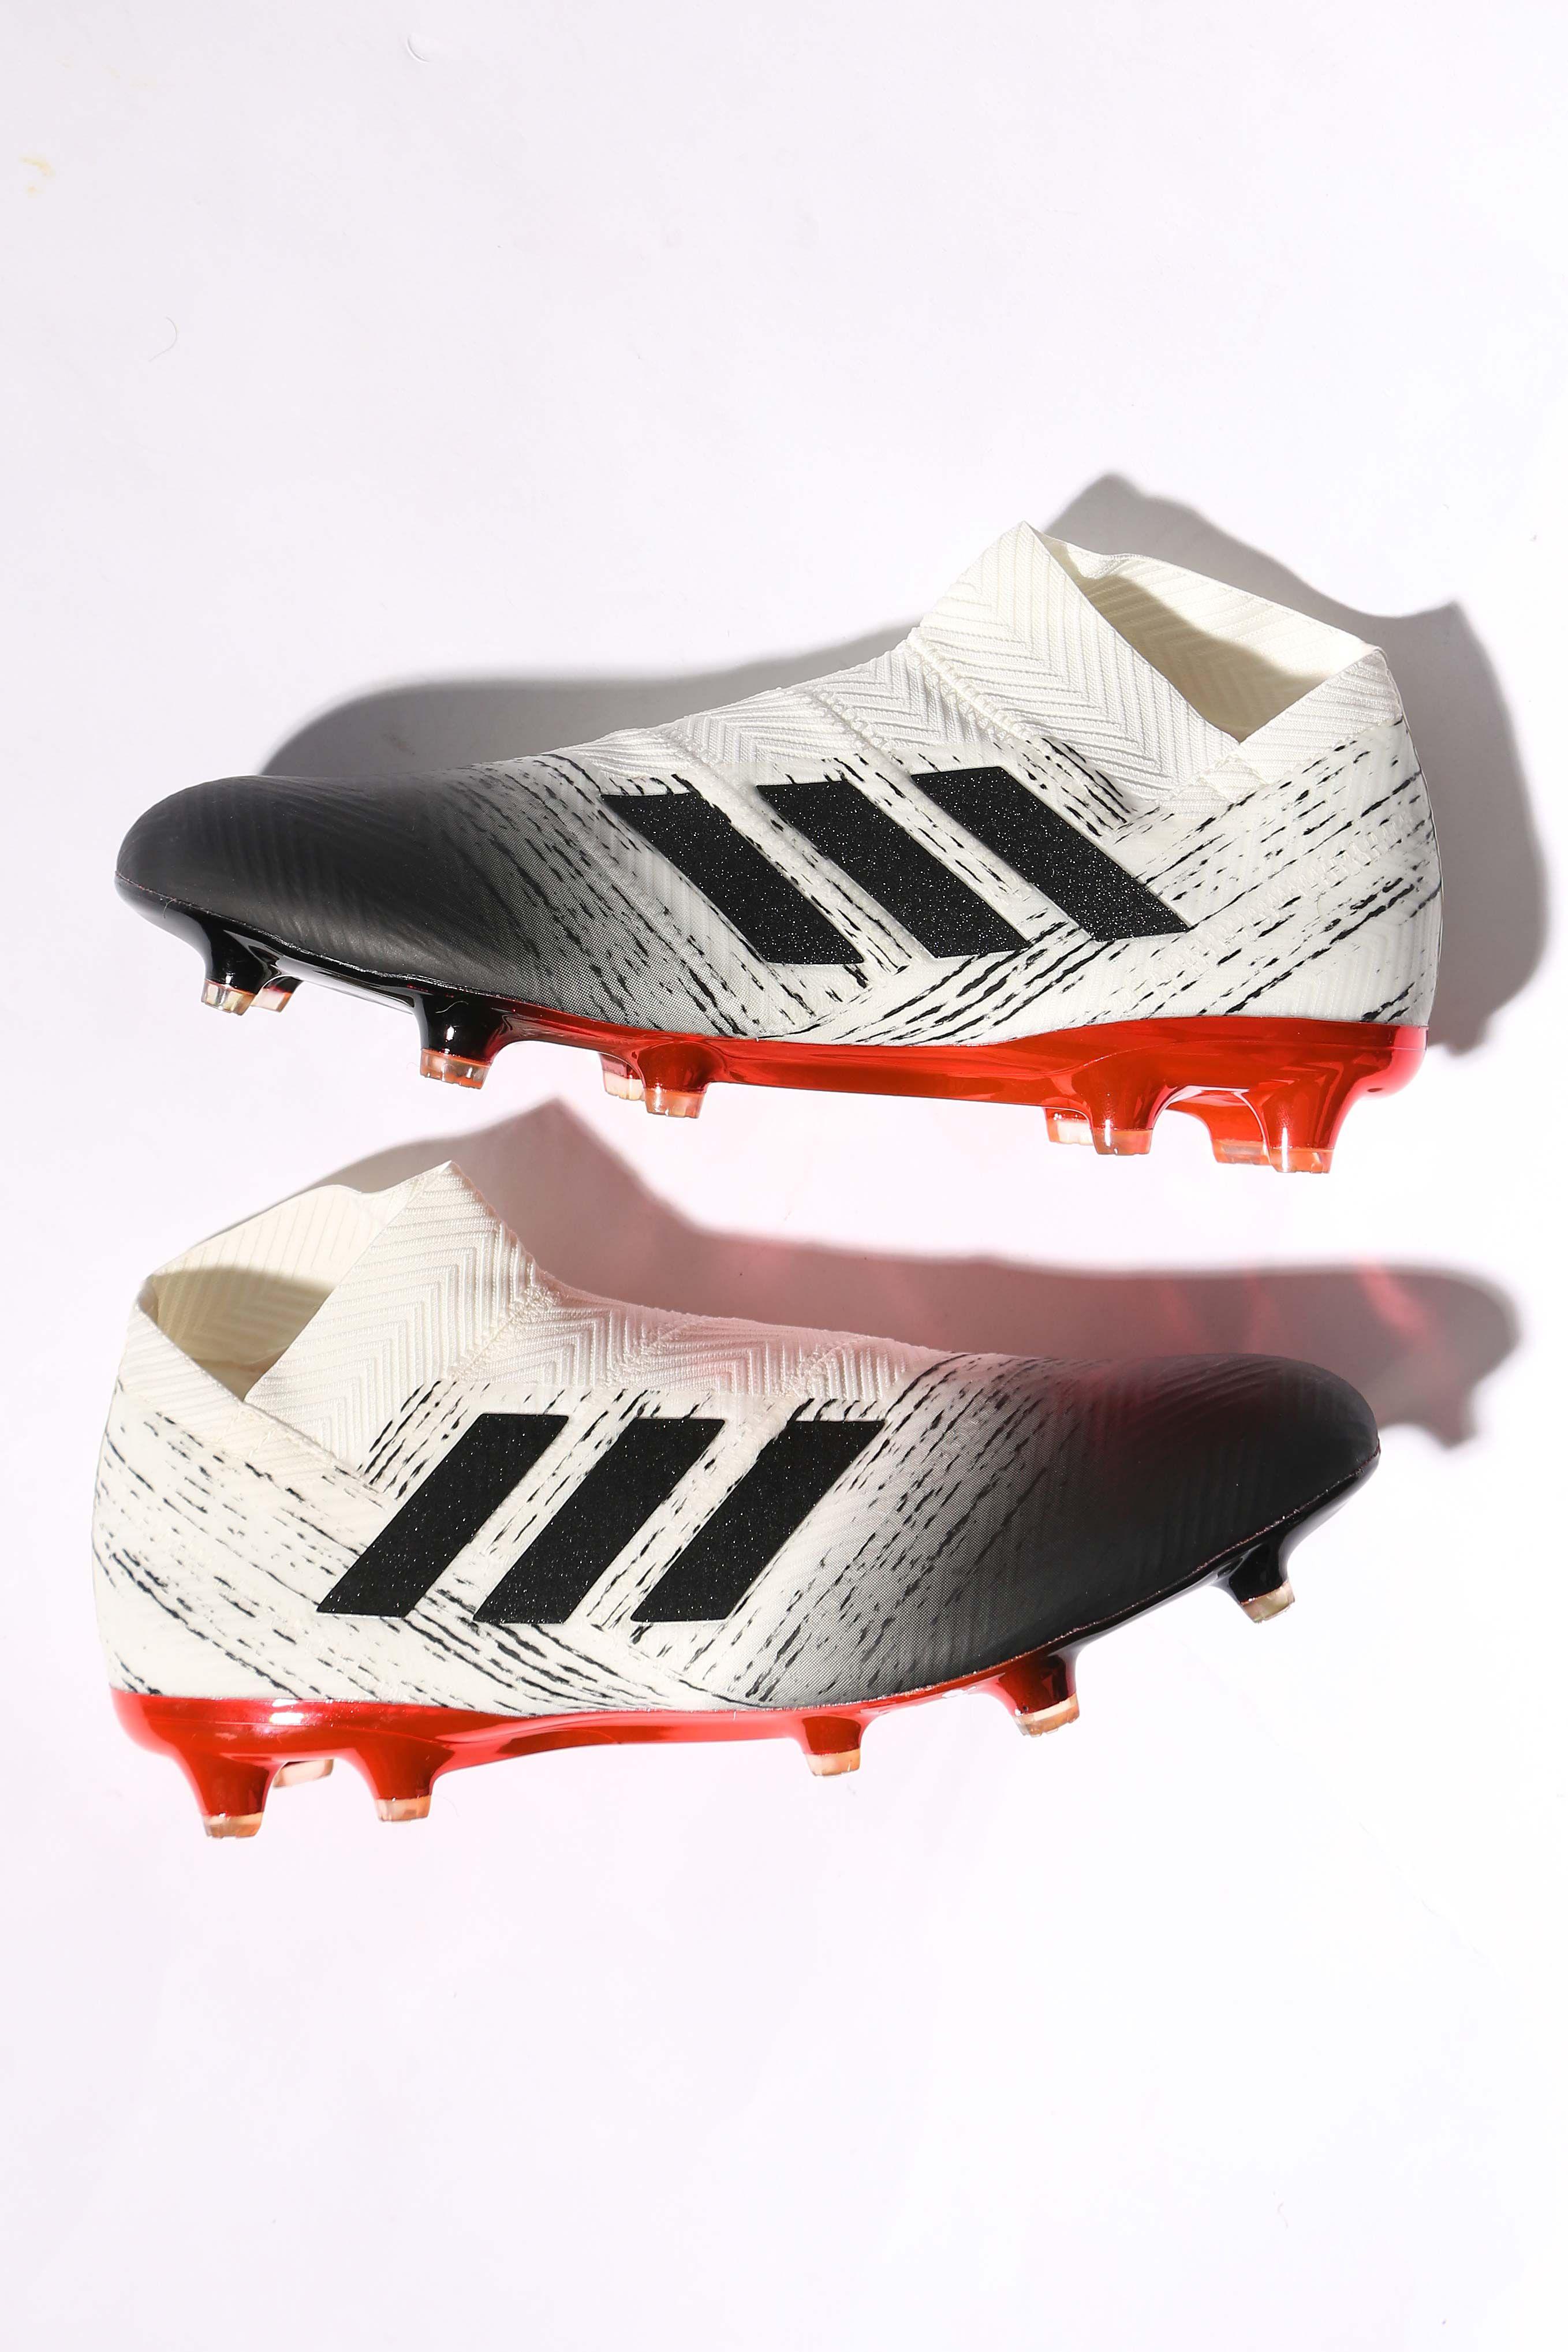 adidas  cleats  initiatorpack  nemeziz  adidasFootball  Football  Soccer   soccercleats Foto  Marcela Sansalvador para futbolmania.com b515069d372a3